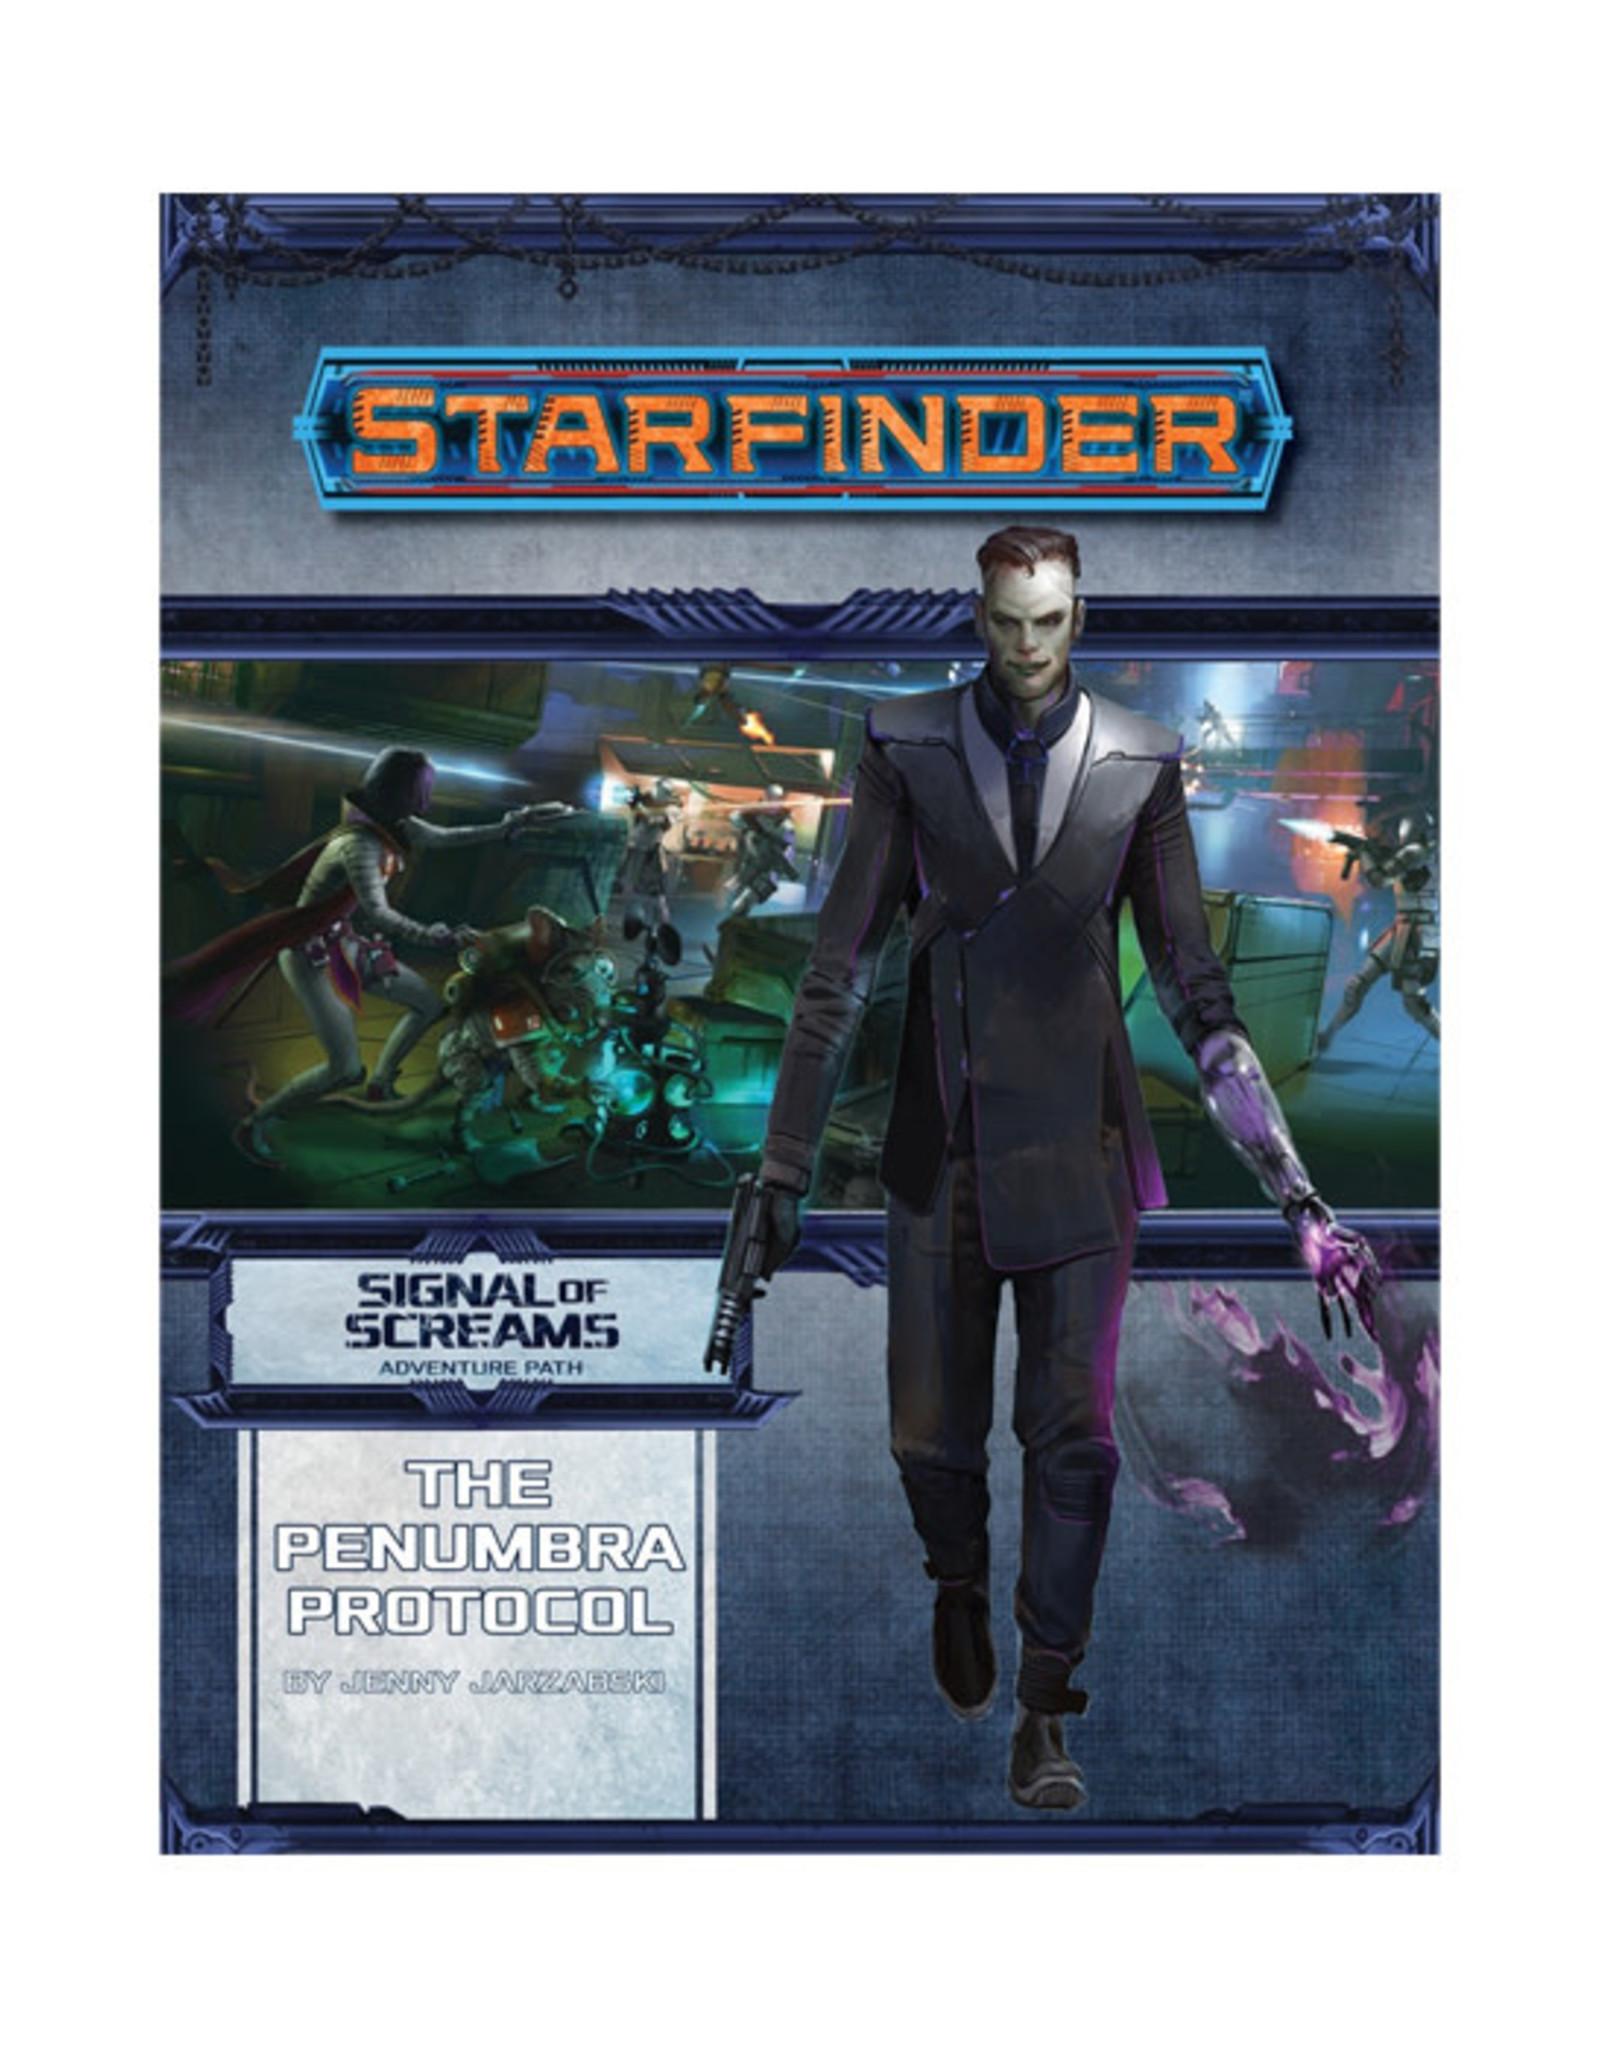 Starfinder Starfinder: Adventure Path - Signal of Screams - The Penumbra Protocol